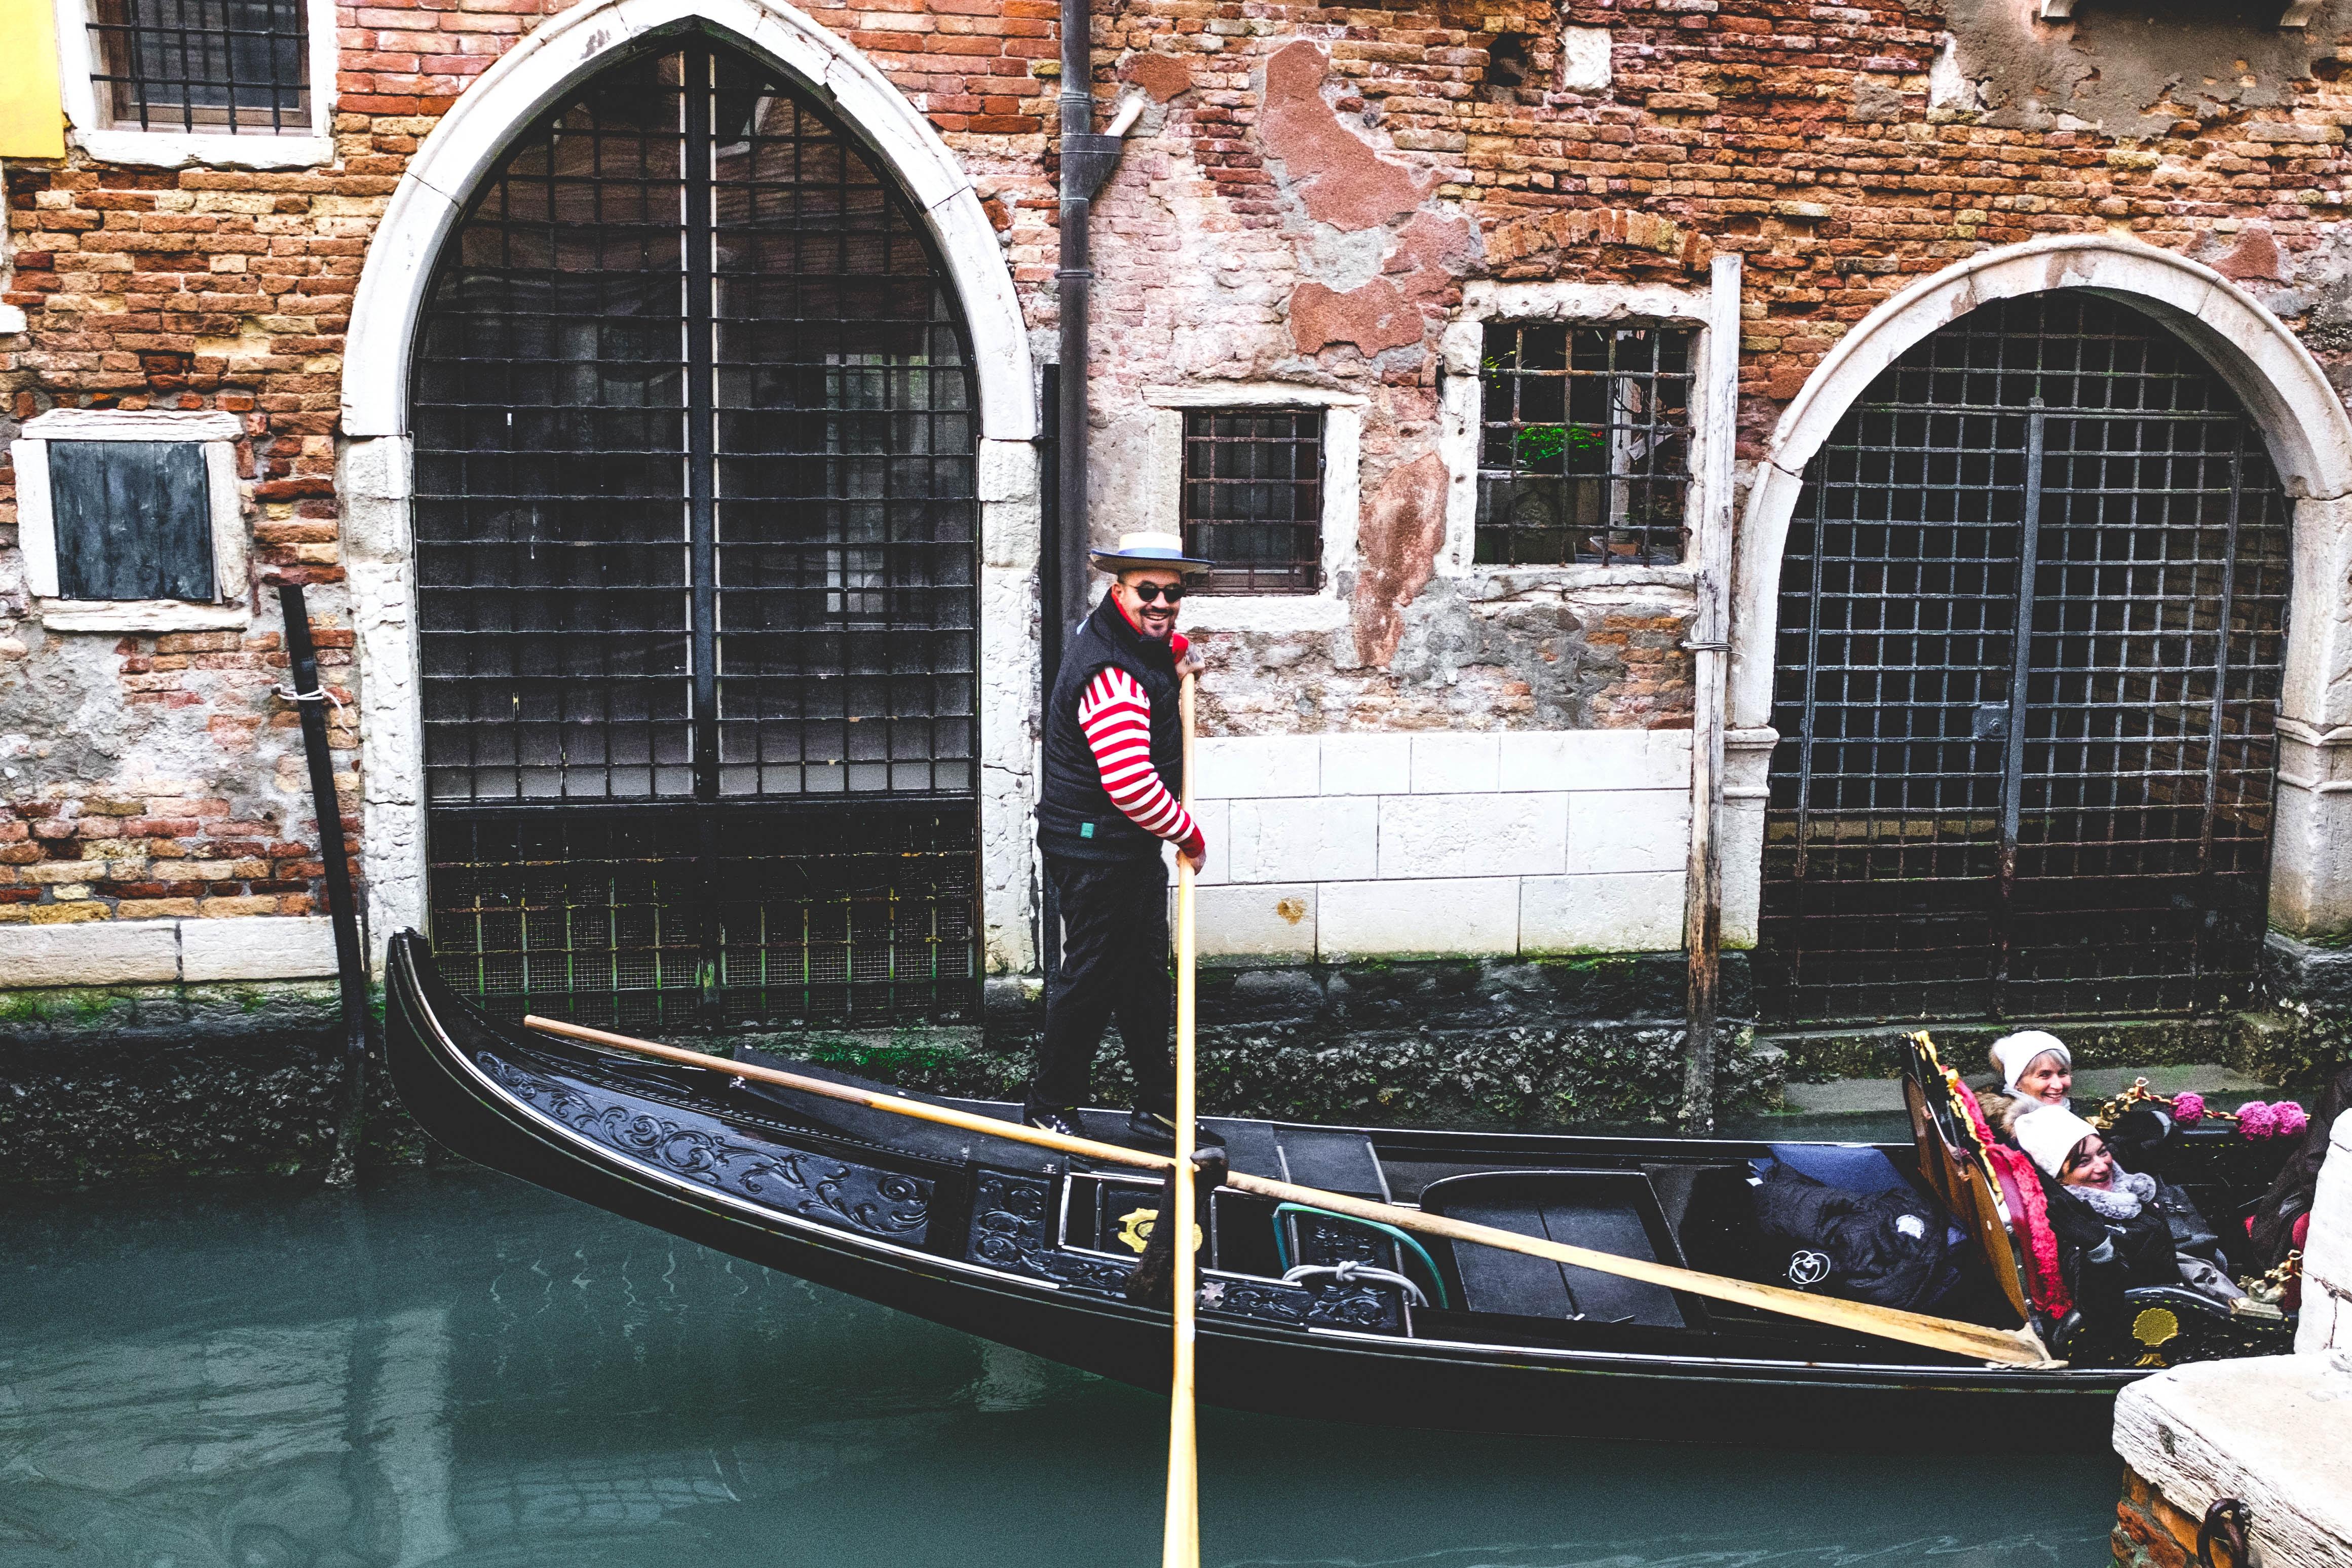 man riding on black boat during daytime